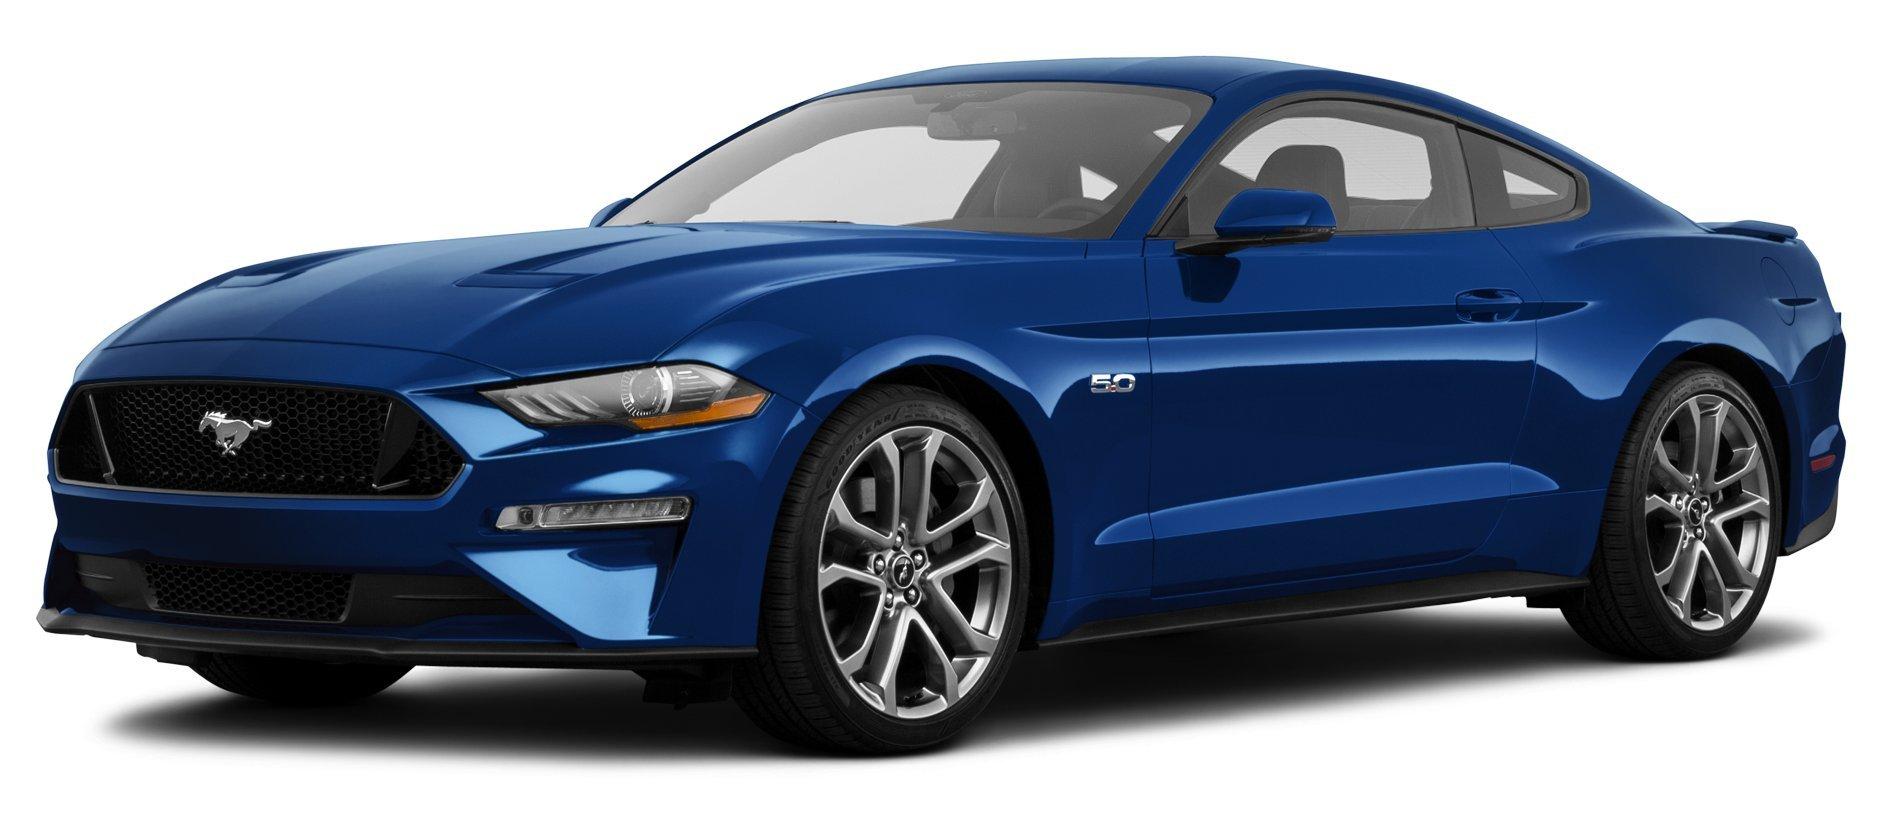 Lightning Blue Mustang >> 2018 Ford Mustang Gt Premium Fastback Lightning Blue Metallic